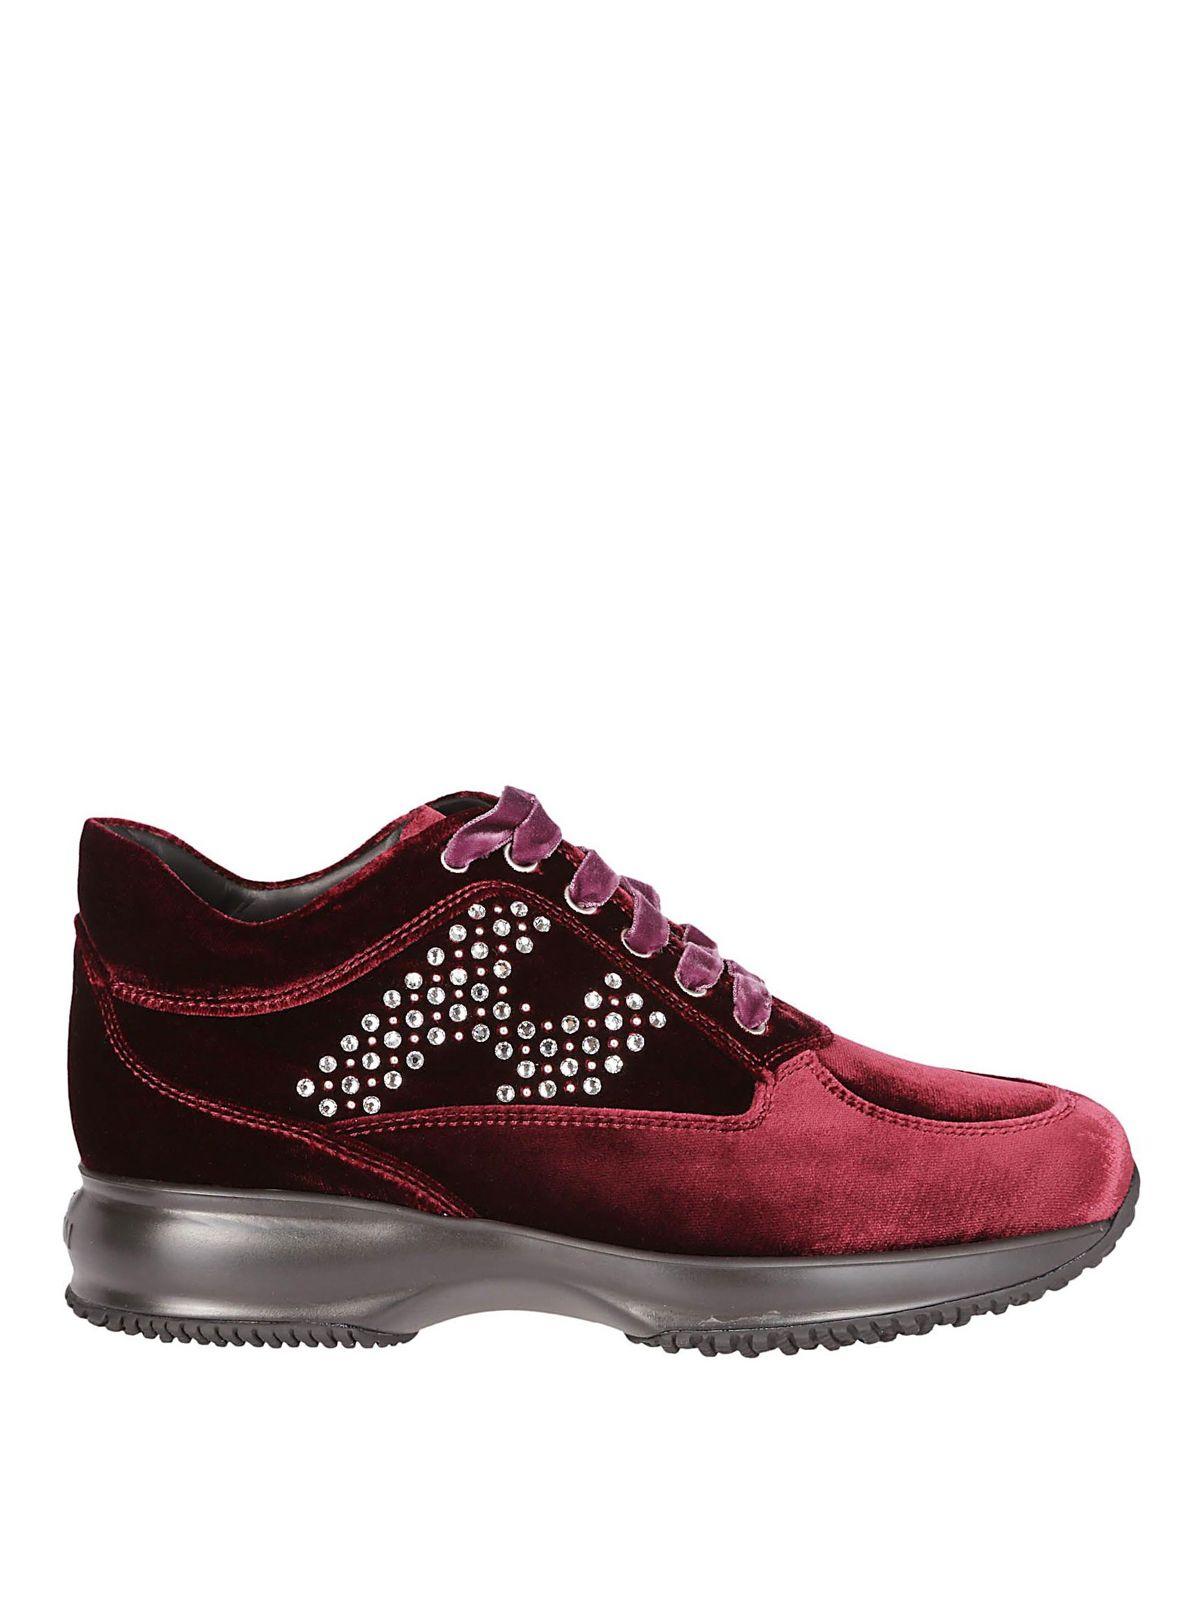 Hogan Burgundy Velvet Lace-Up Shoes